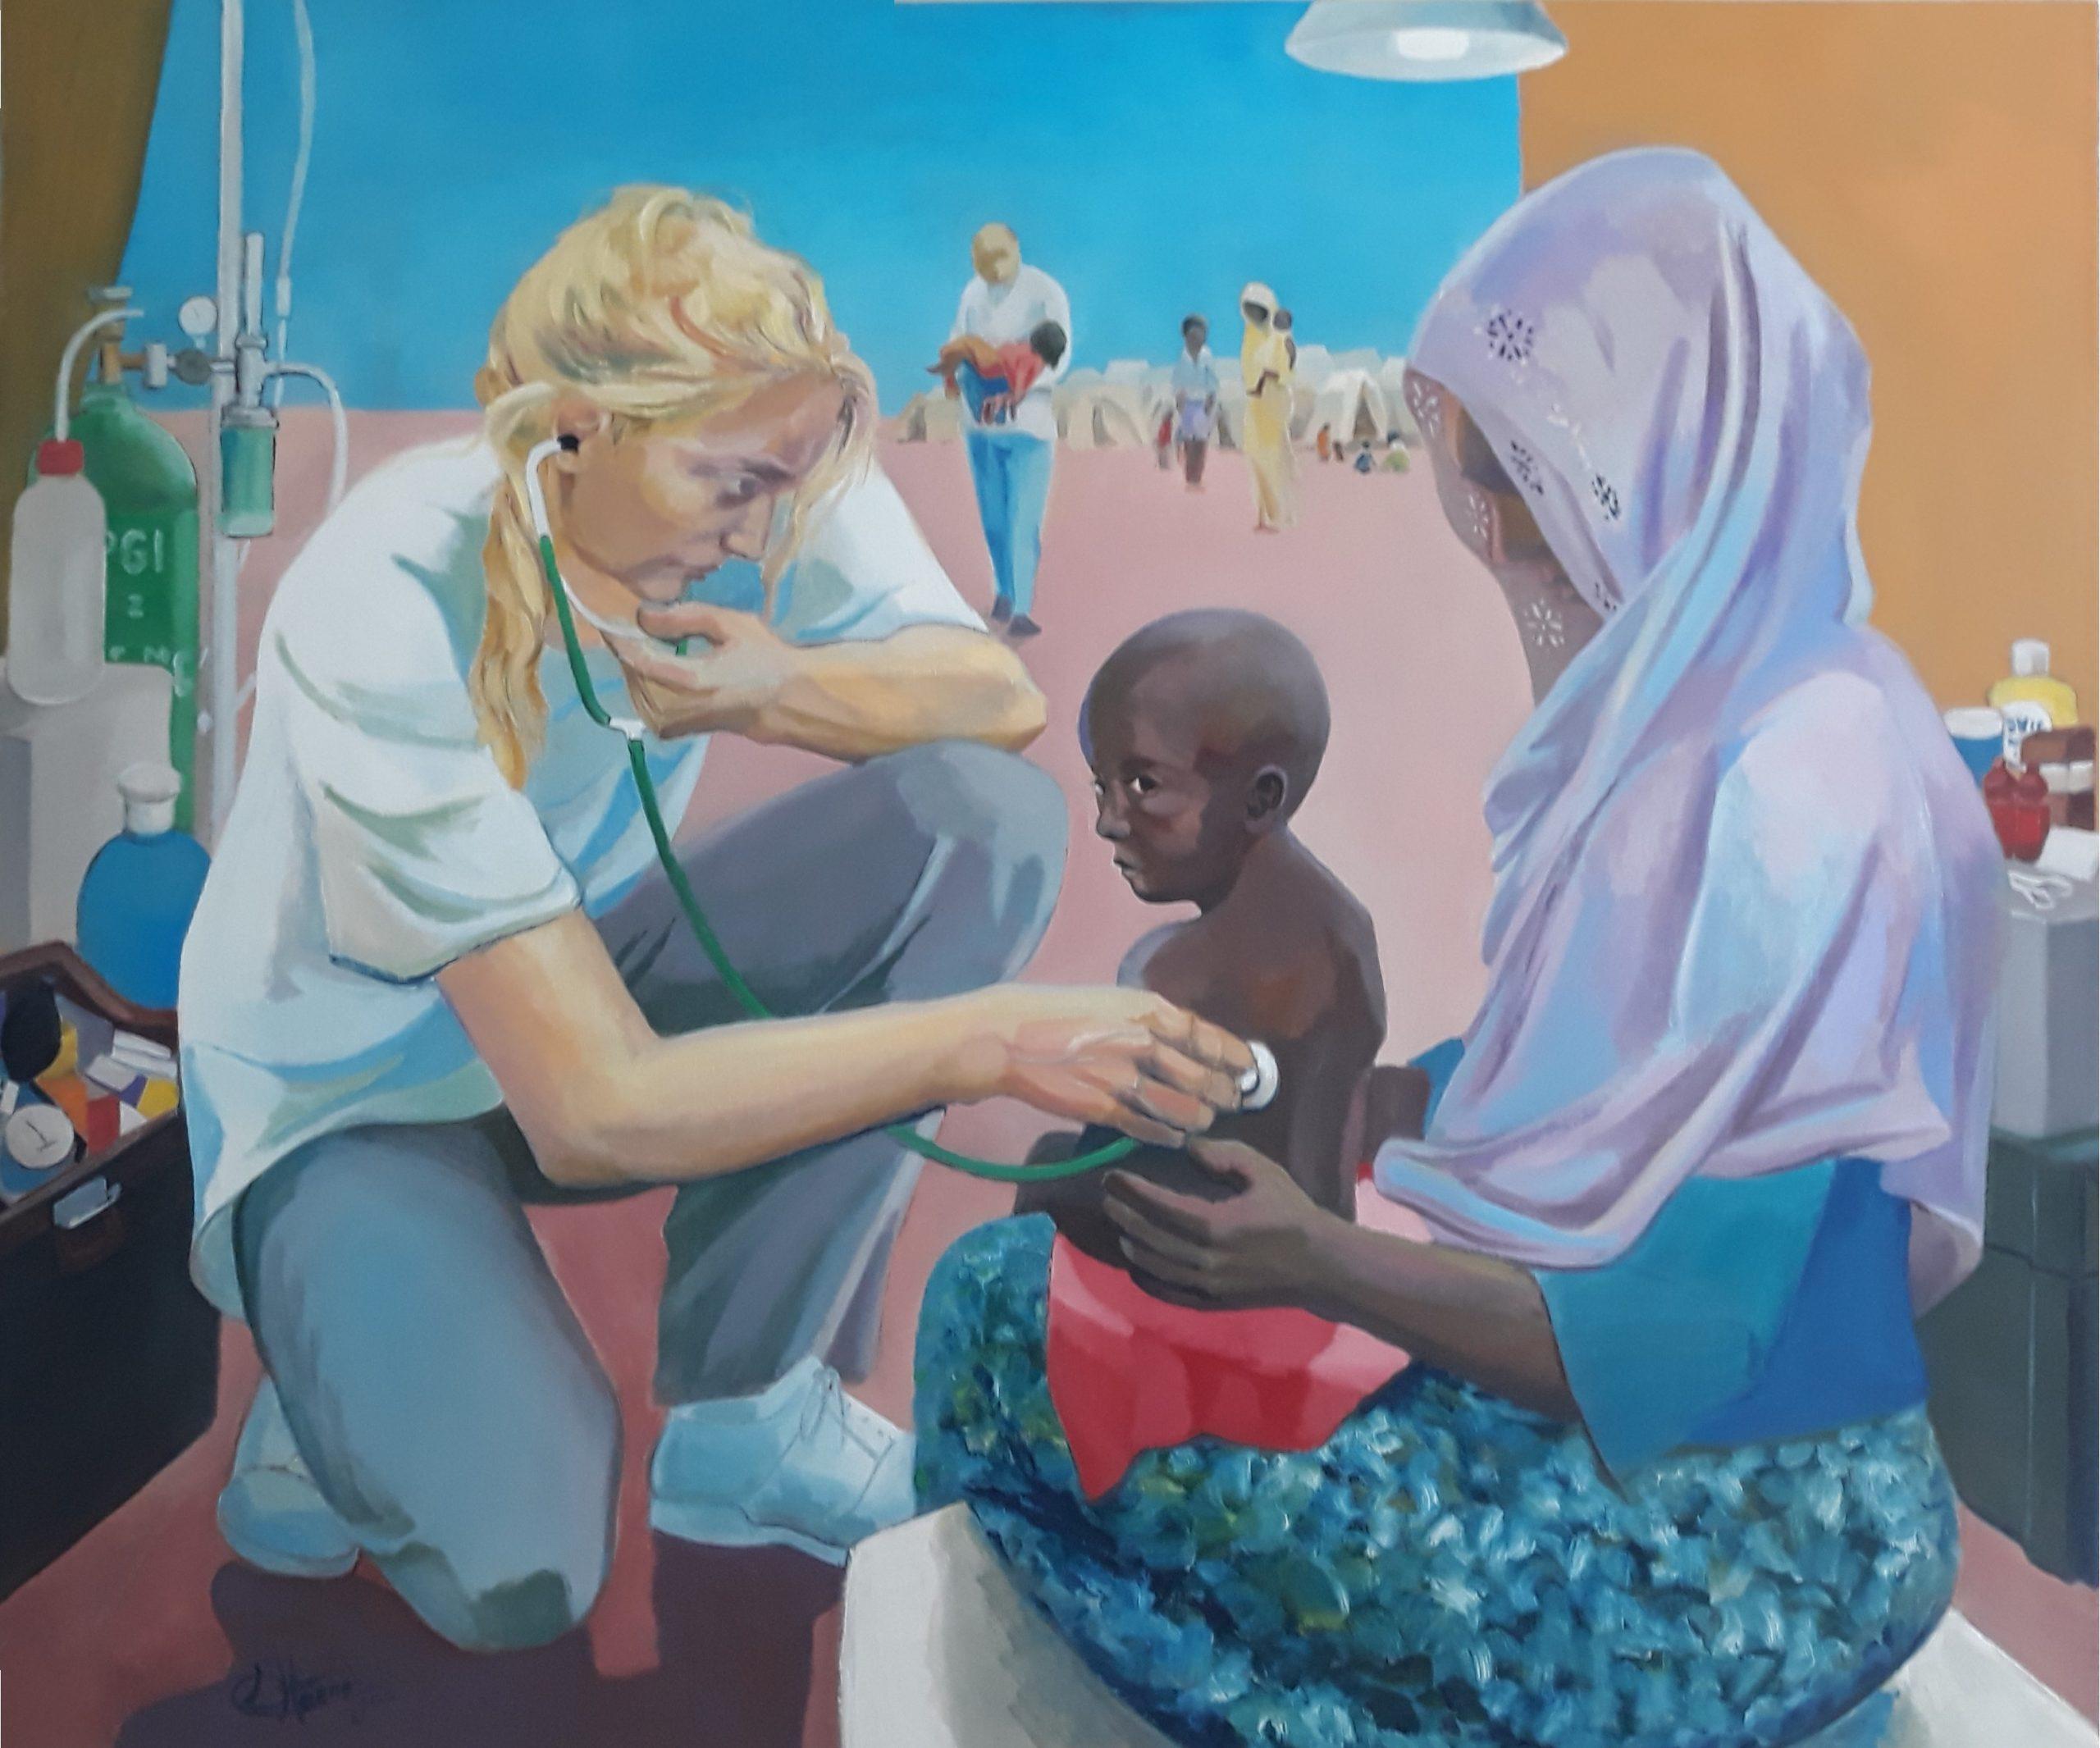 854 arts zonder grenzen 120 x 100